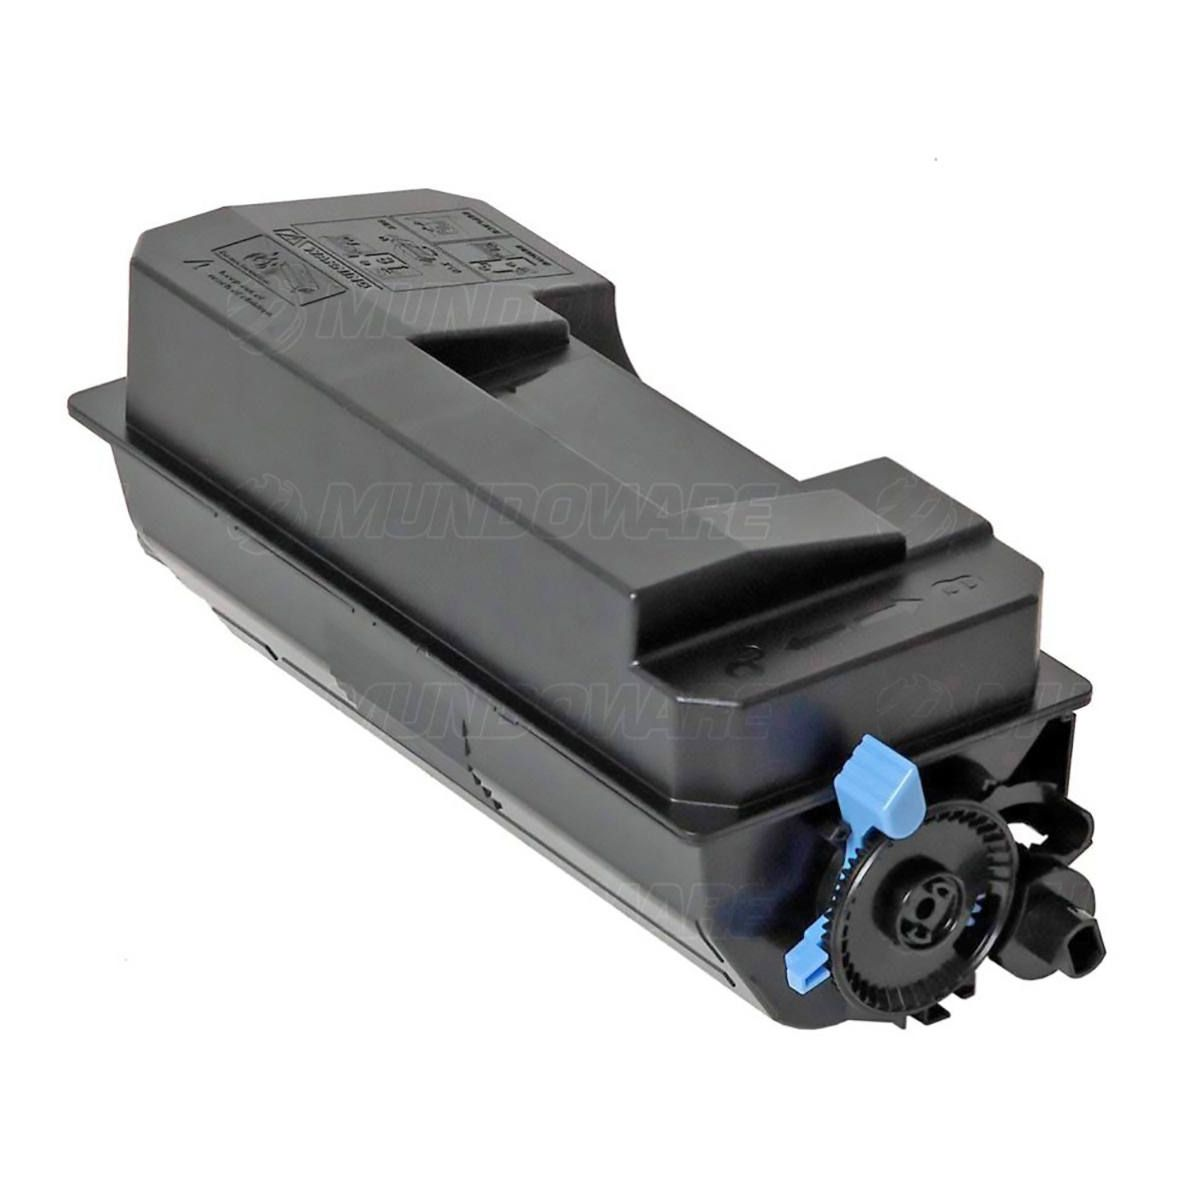 Compatível: Toner TK3122 TK-3122 para Impressora Kyocera FS4200 FS4200DN FS-4200 FS-4200DN / Preto / 21.000